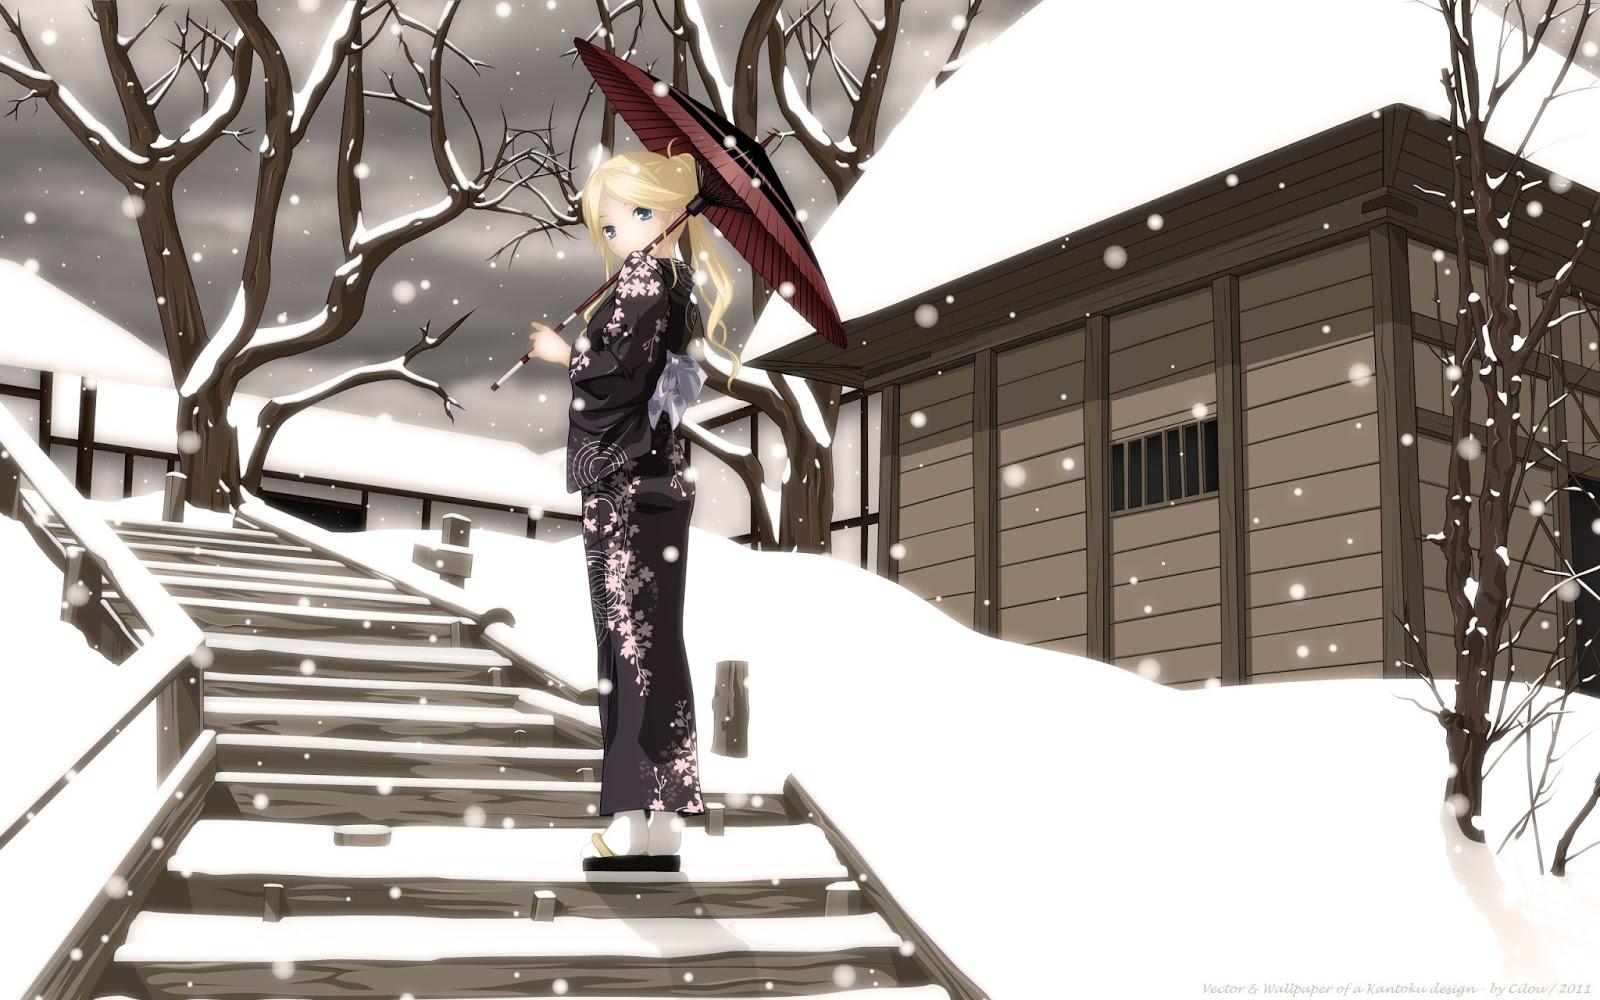 3D Anime Girl Wallpapers